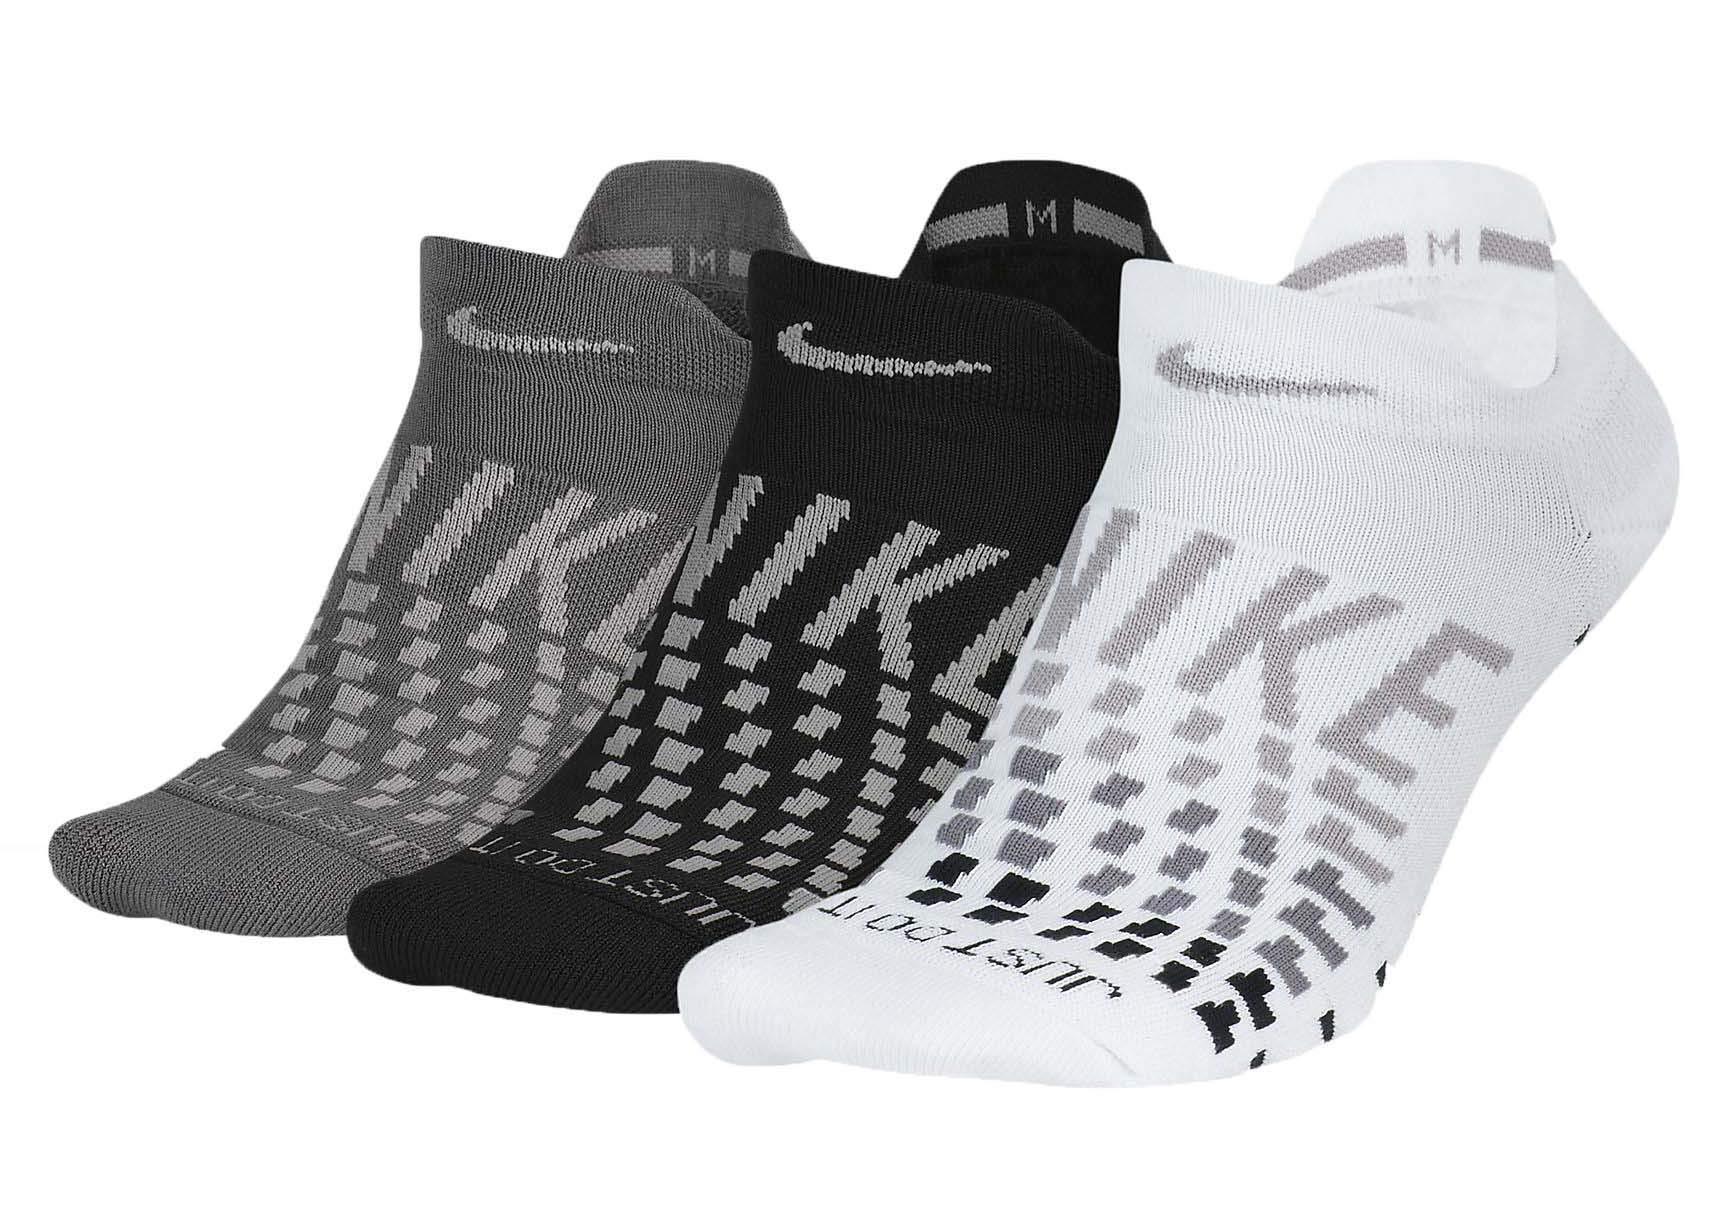 Nike Women's Everyday Max Cushion No-Show Training Socks (Multi-Color3, M) by Nike